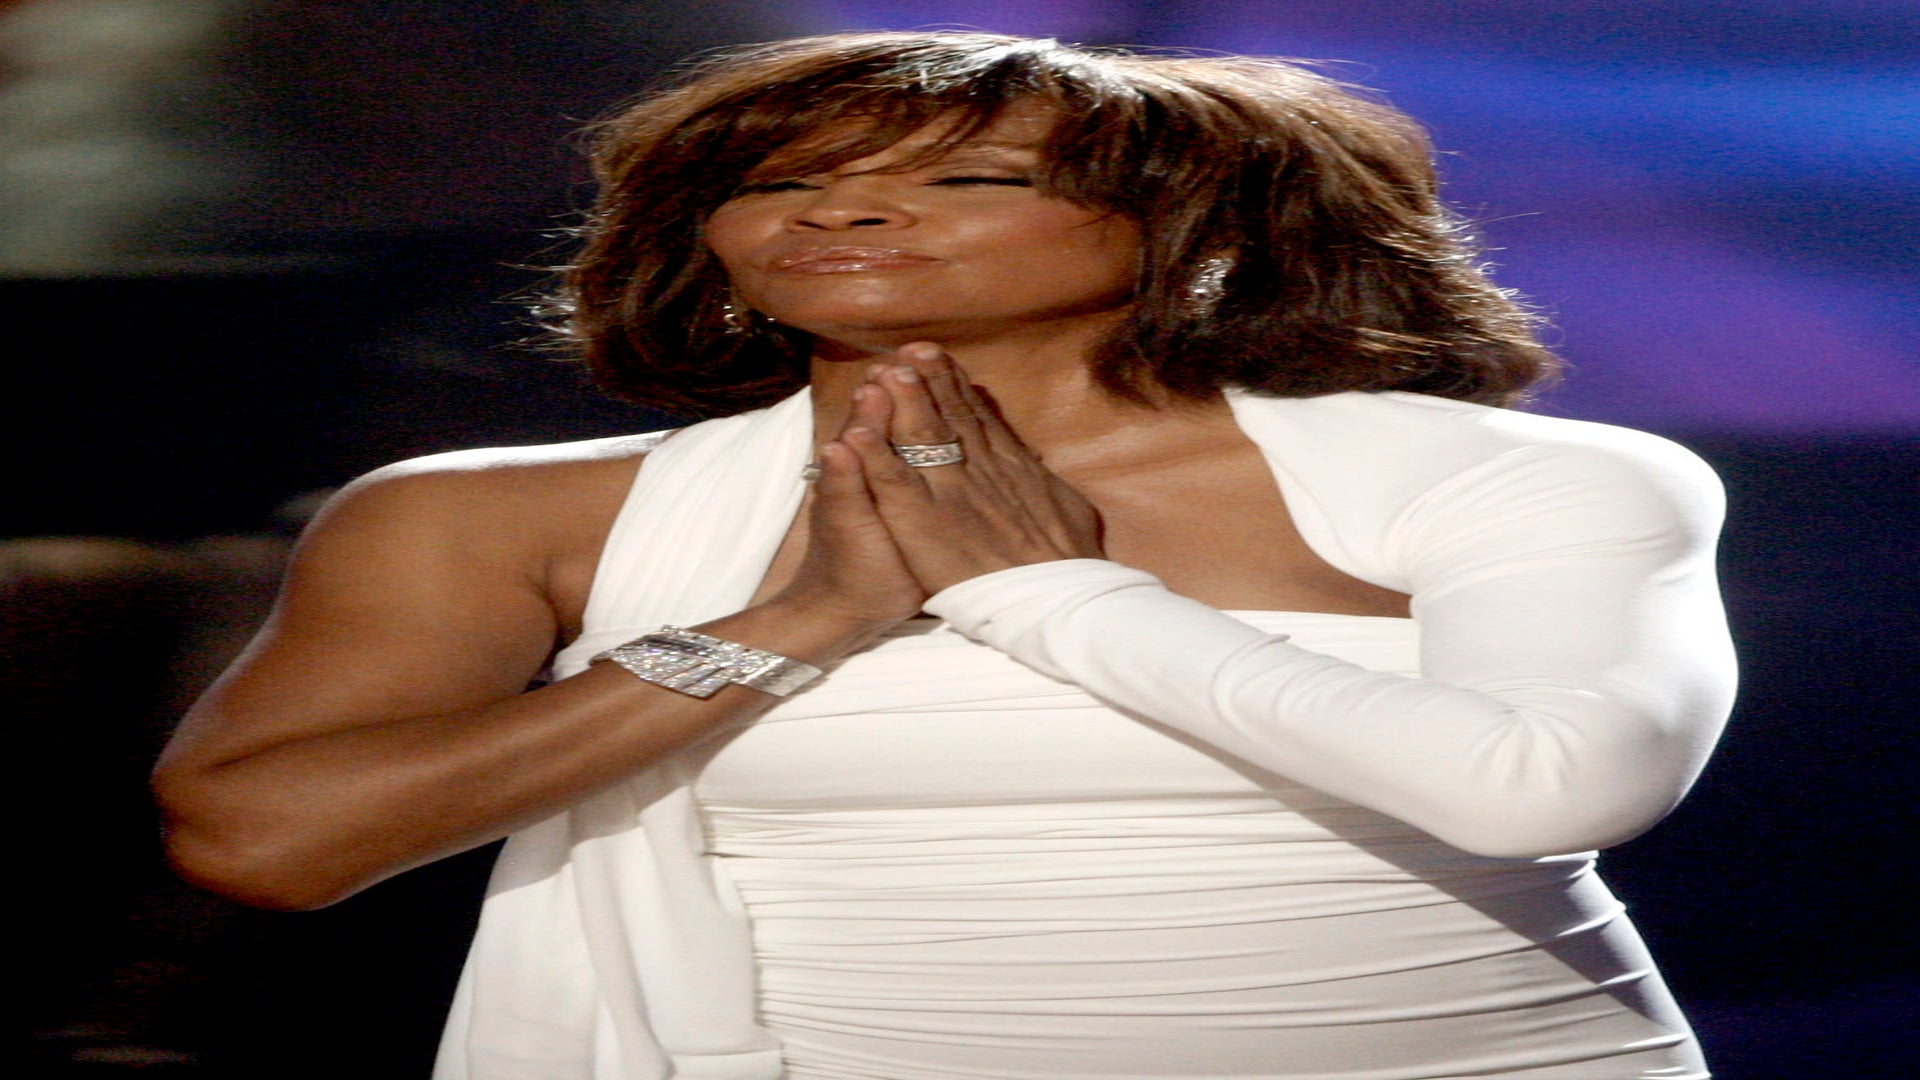 Whitney Houston's Family: She Deserves More Than a TV Movie